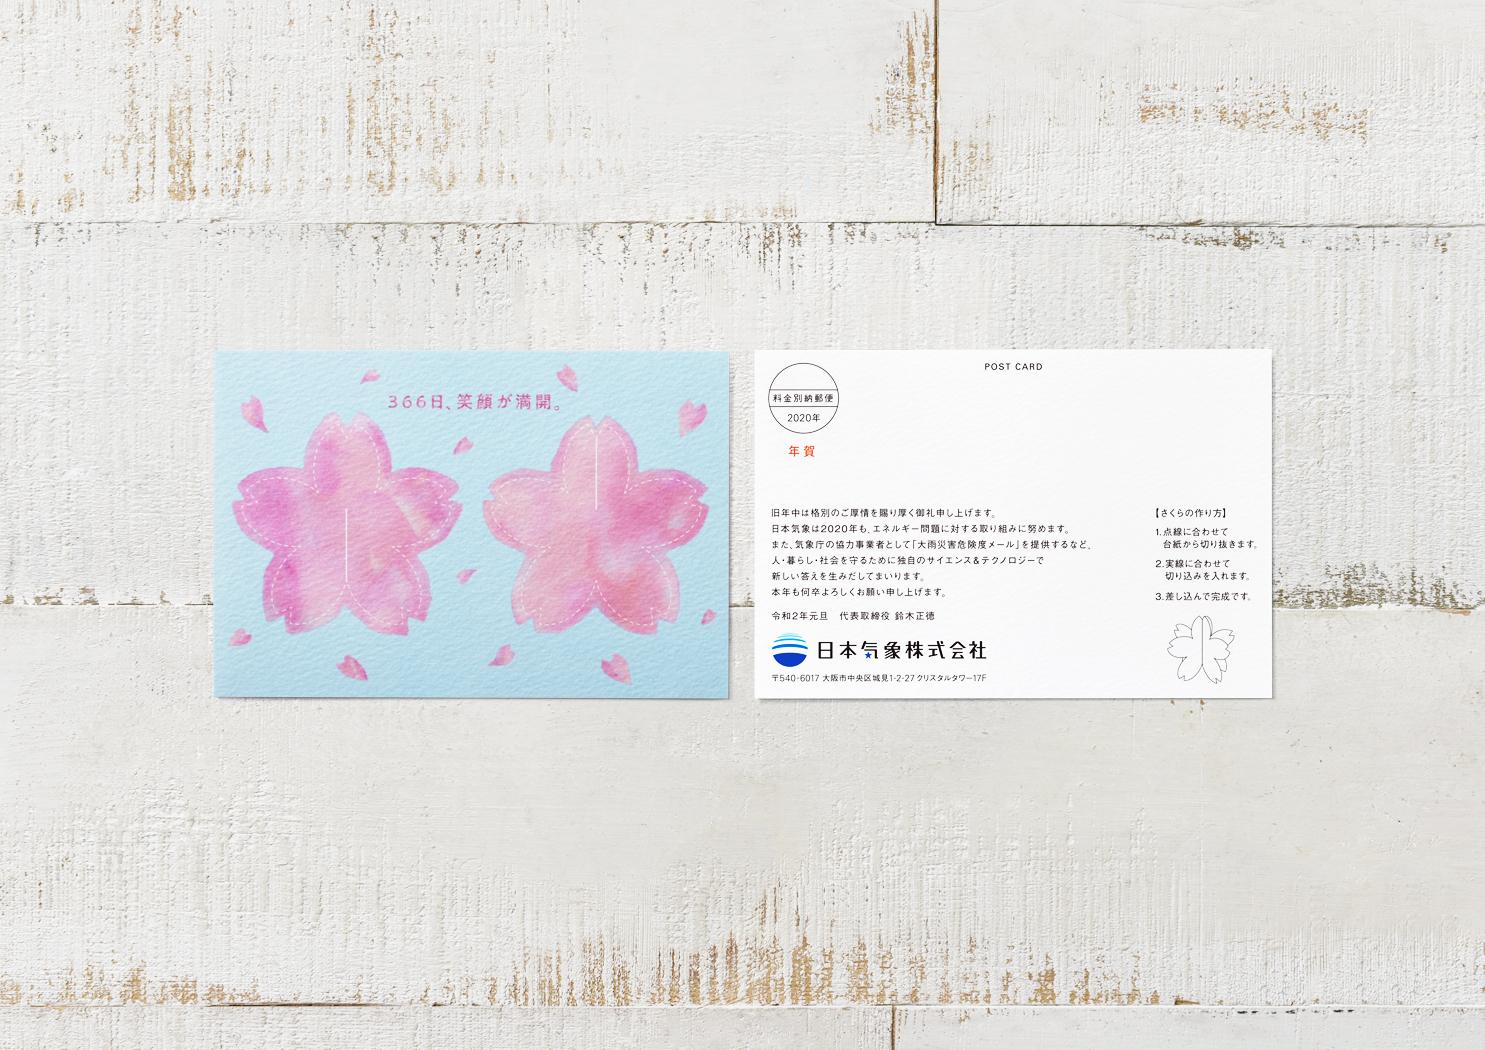 Nihonkisho New Year's Card 2020